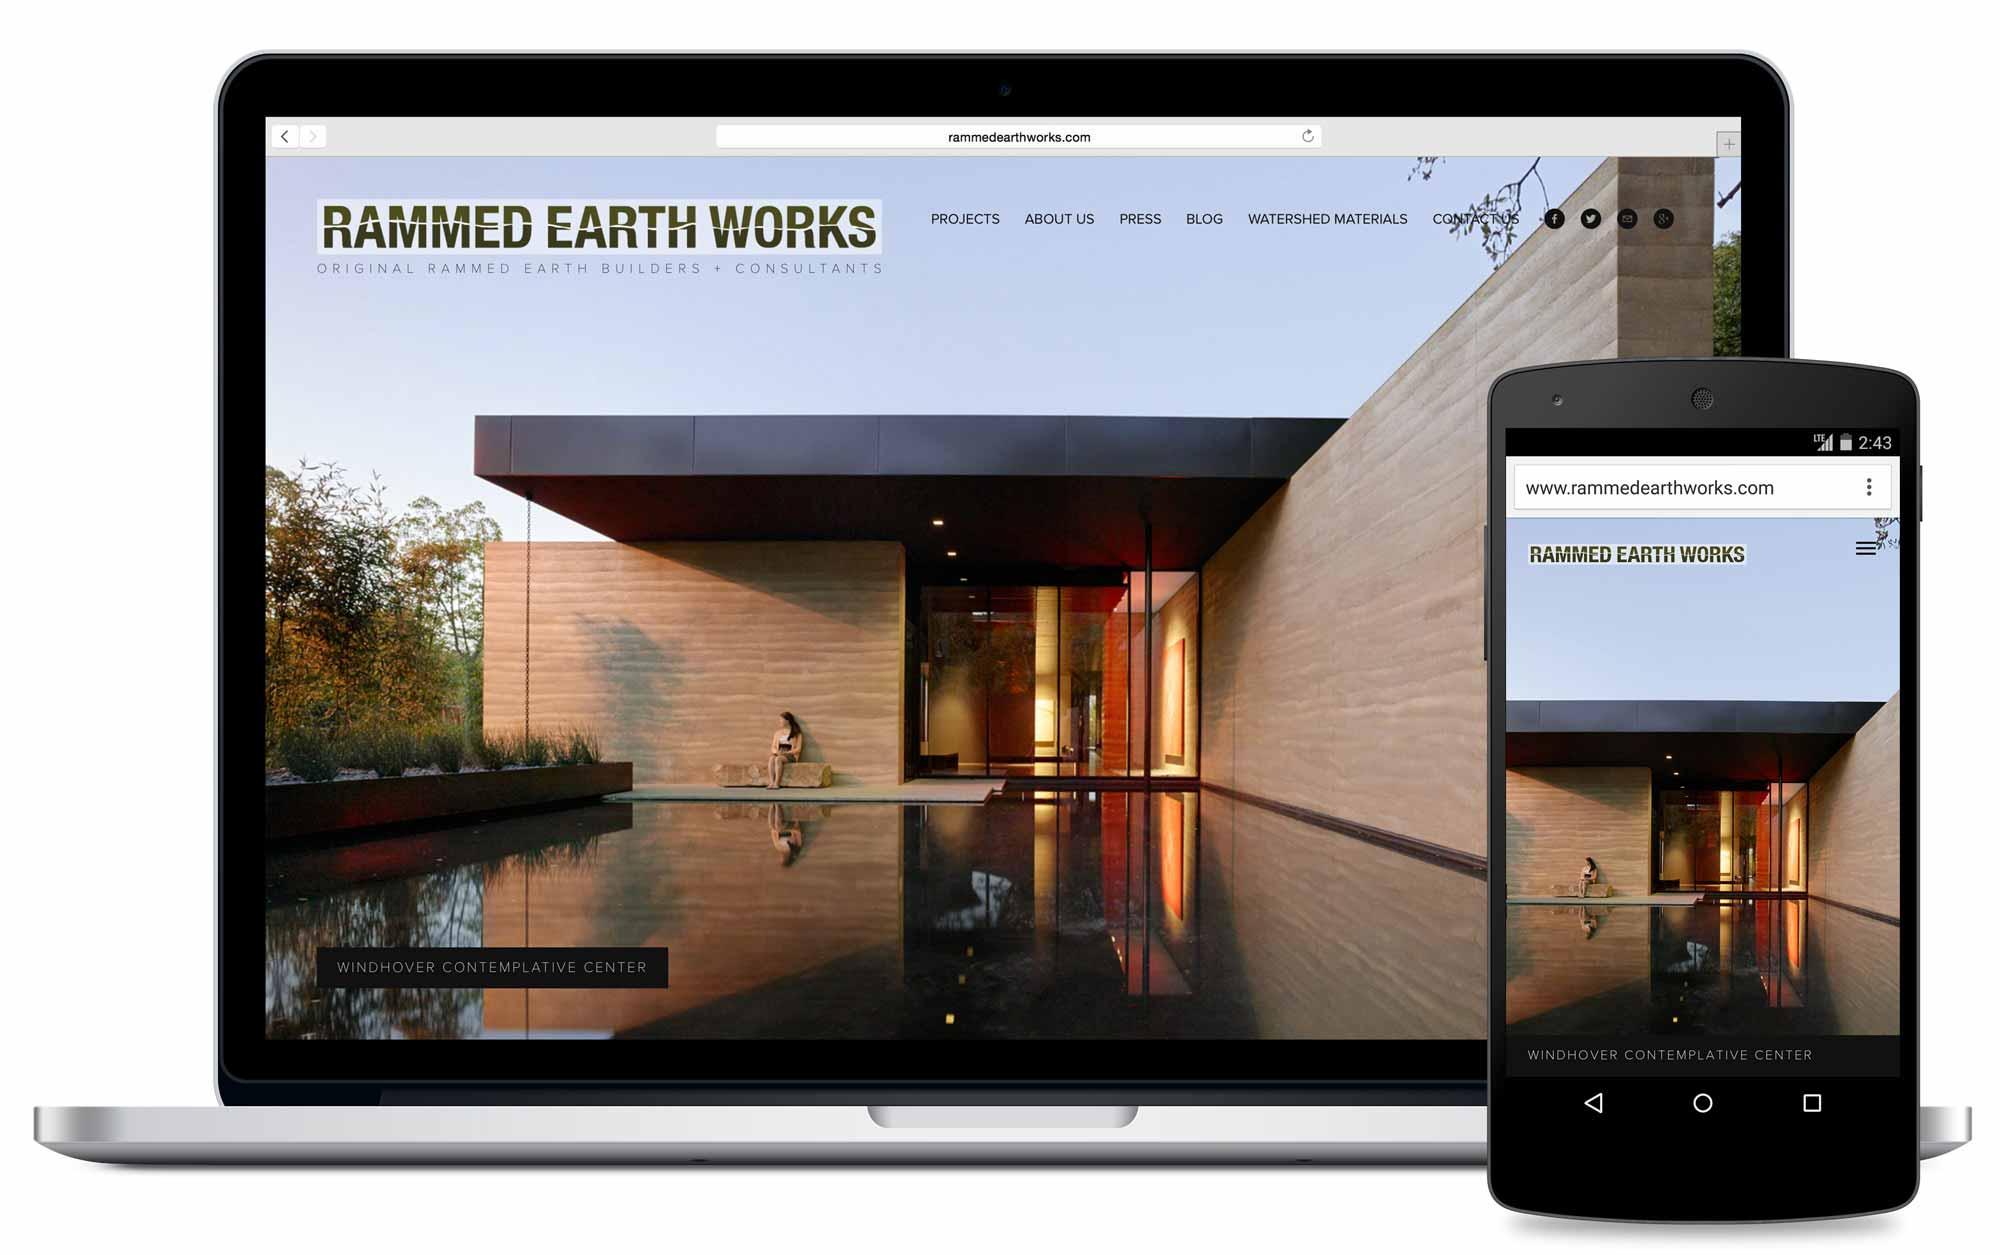 Rammed-Earth-Works-Com-1-150202.jpg